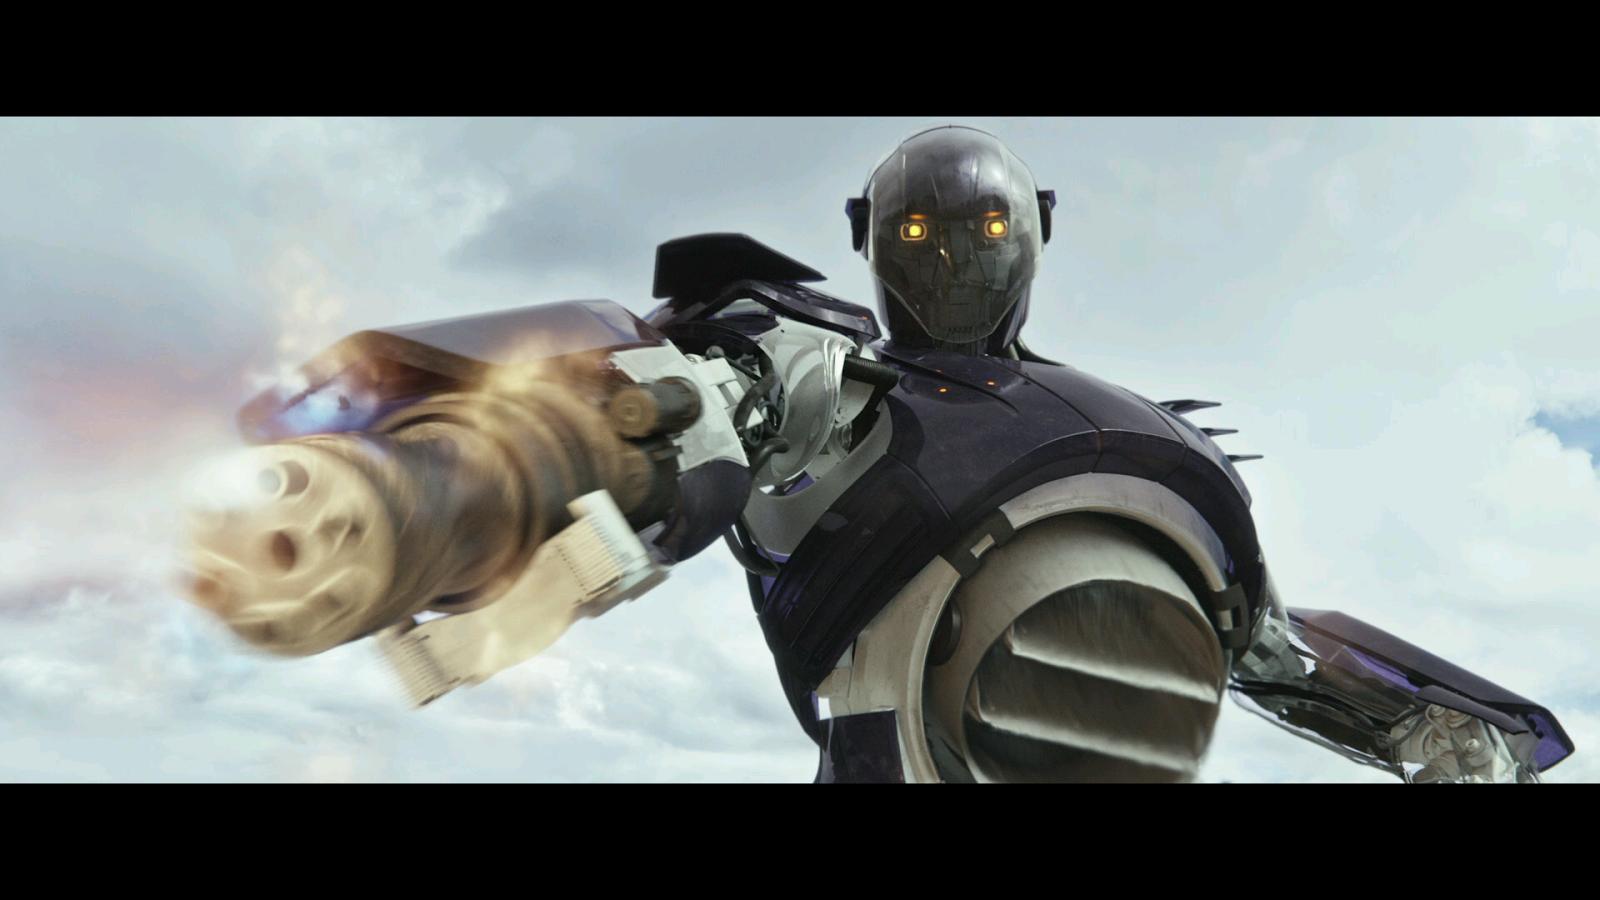 X-Men Días Del Futuro Pasado (2014) 2D + 3D 1080p BD25 5